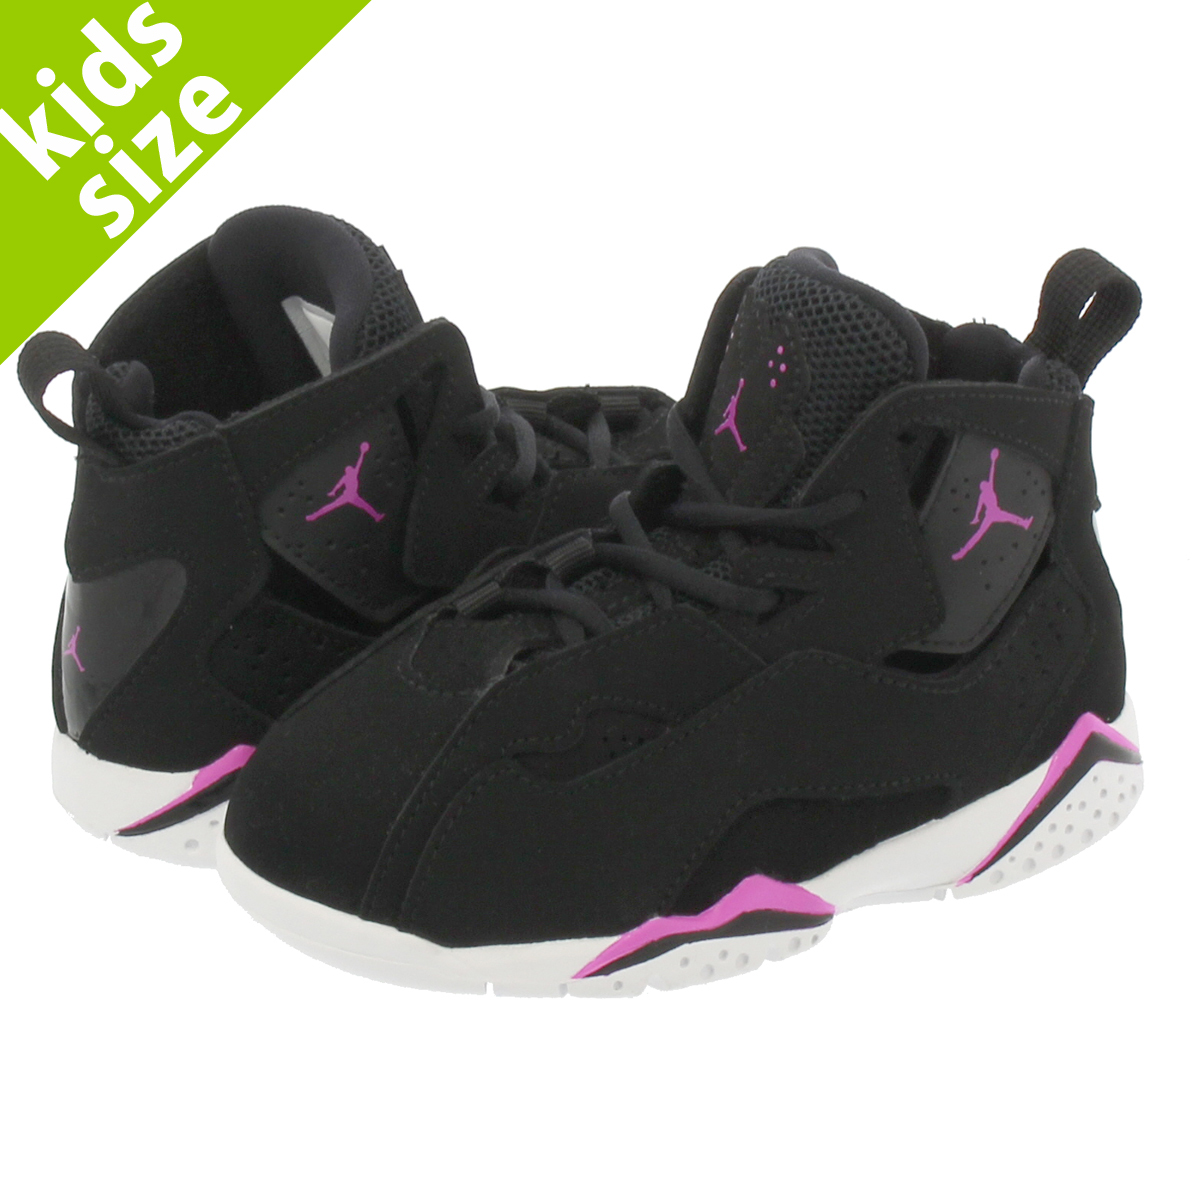 9d6f8986179e NIKE JORDAN TRUE FLIGHT TD Nike Air Jordan toe roof light TD BLACK FUSCHSIA  BLAST WHITE 645